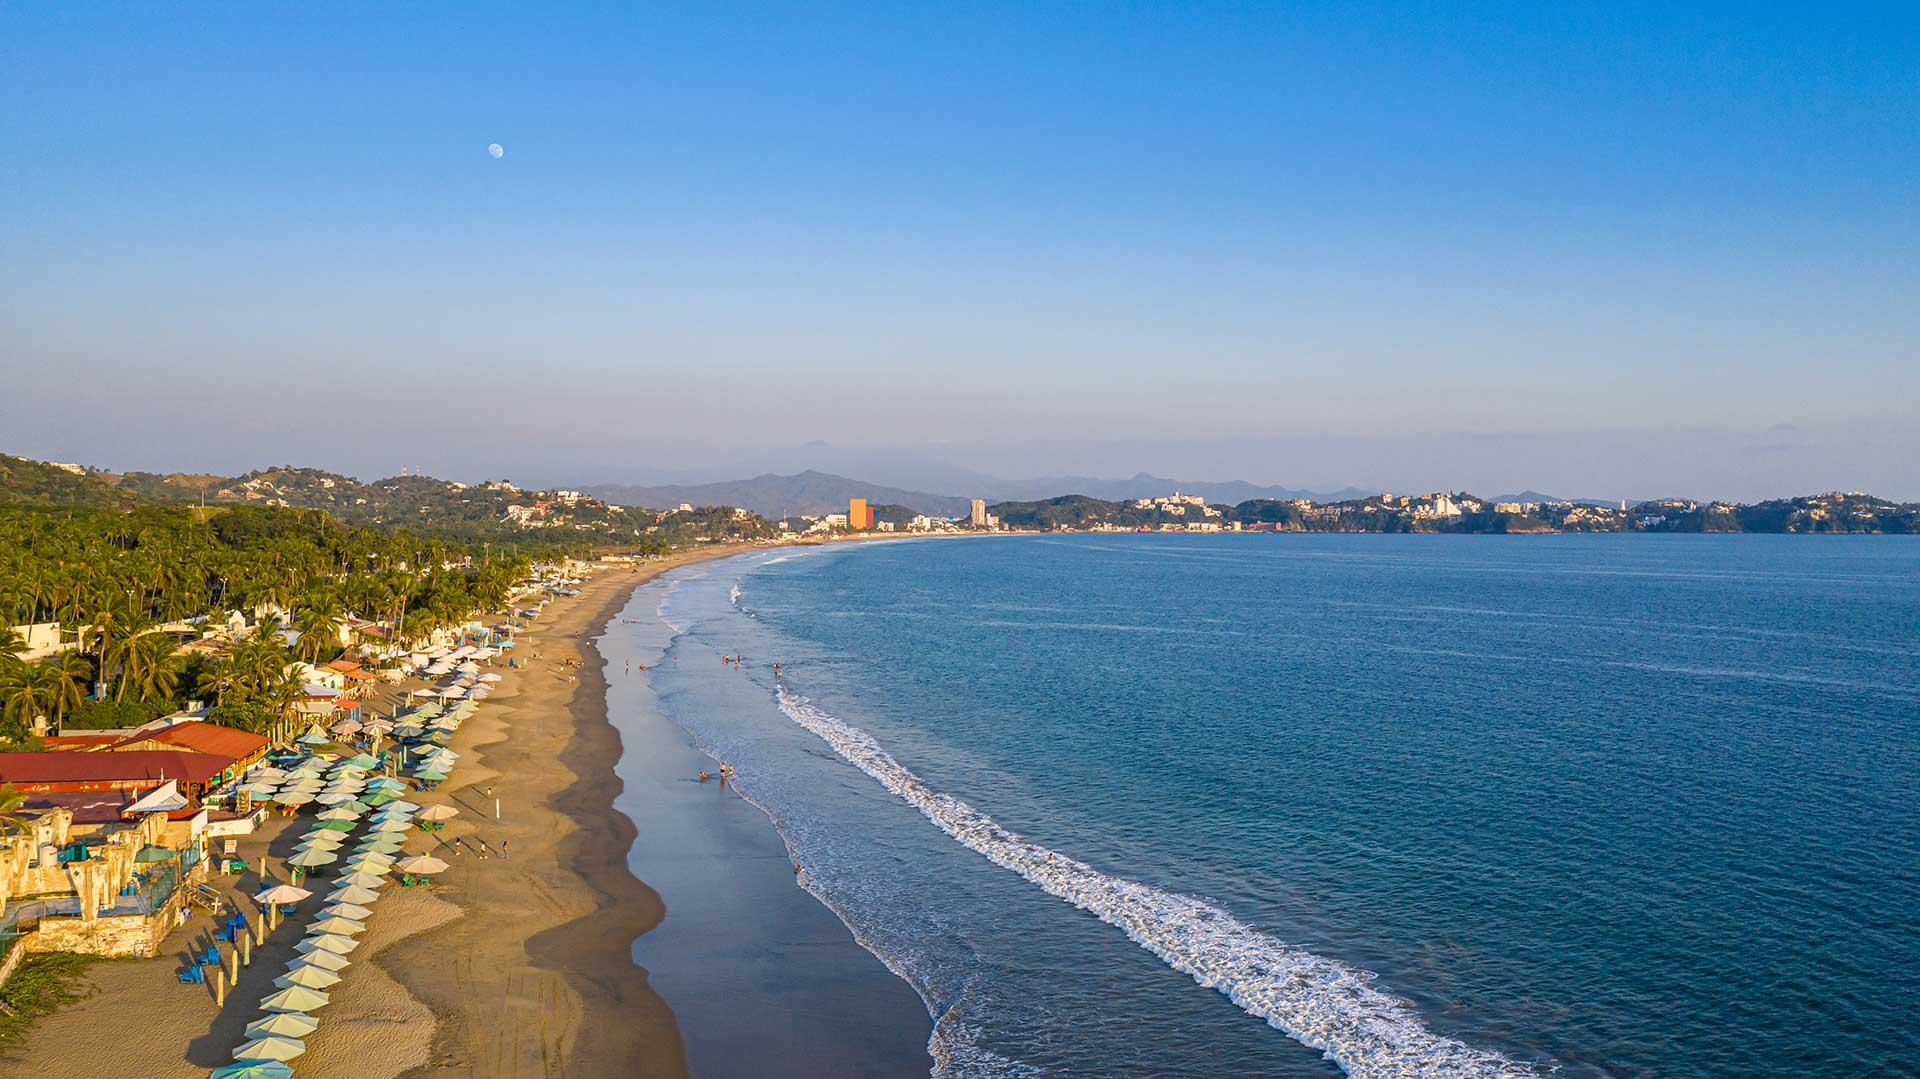 Destinos de playa Manzanillo